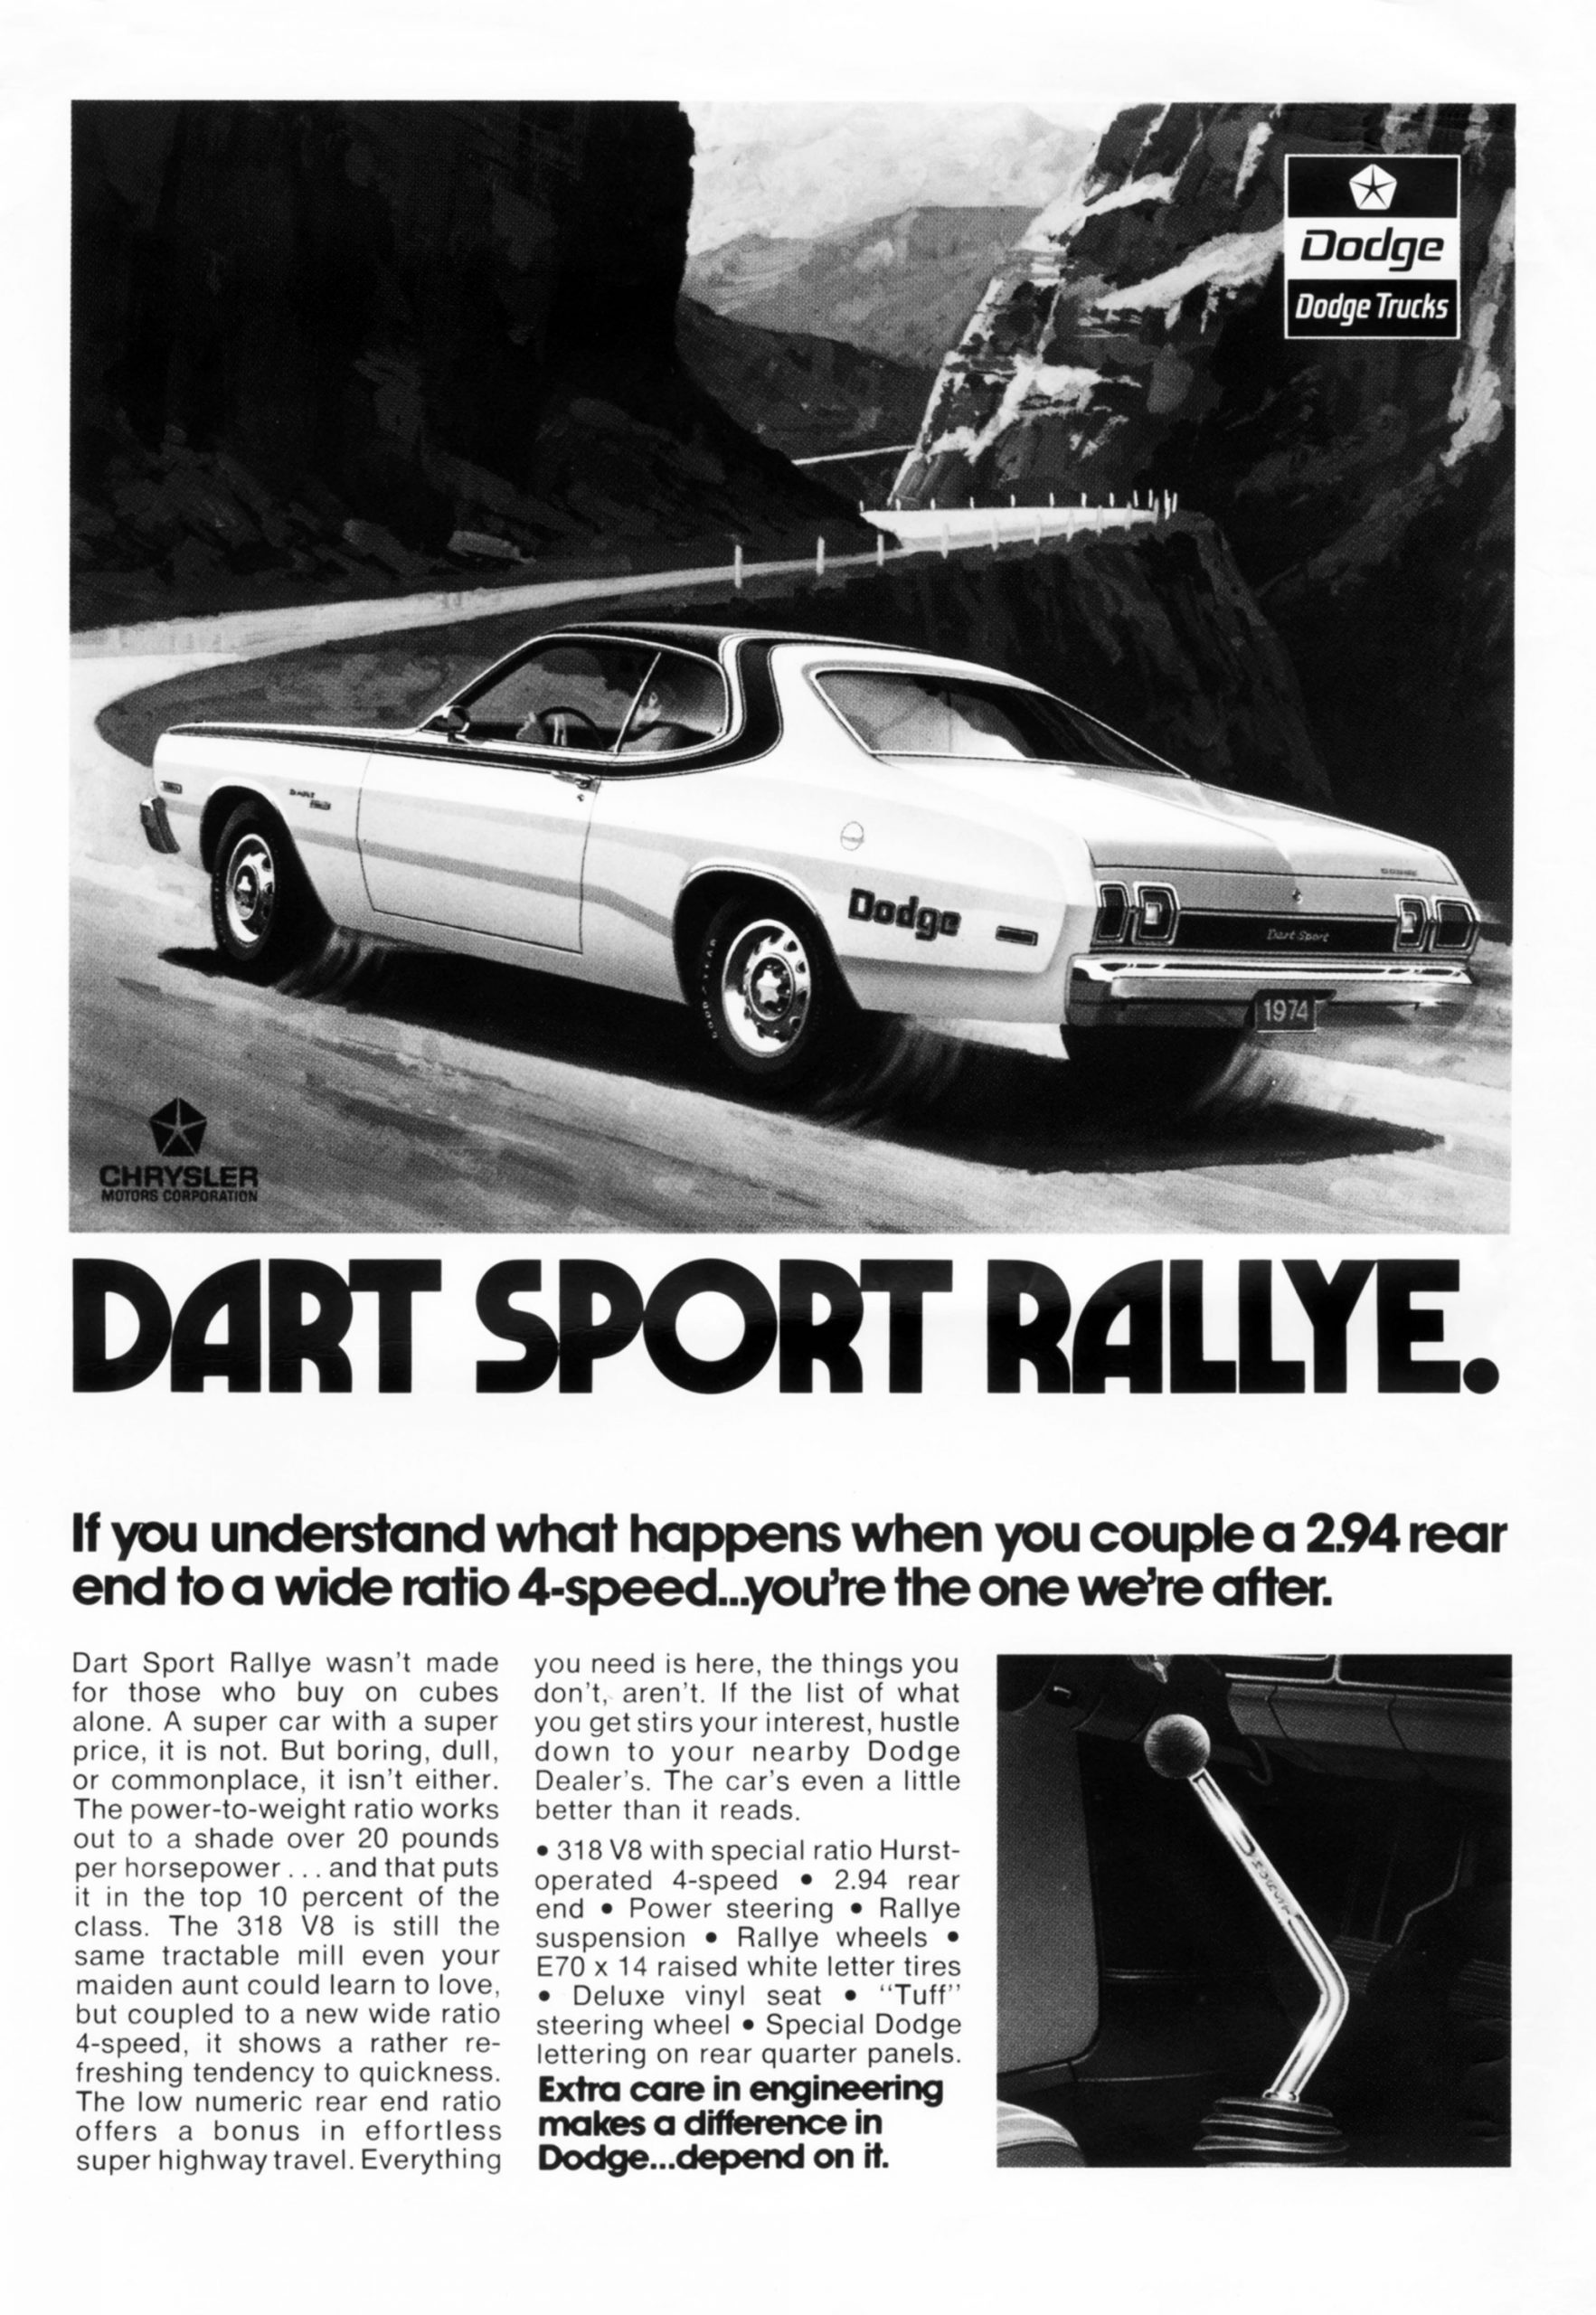 1974 Dodge Dart Sport Rallye Advertisement